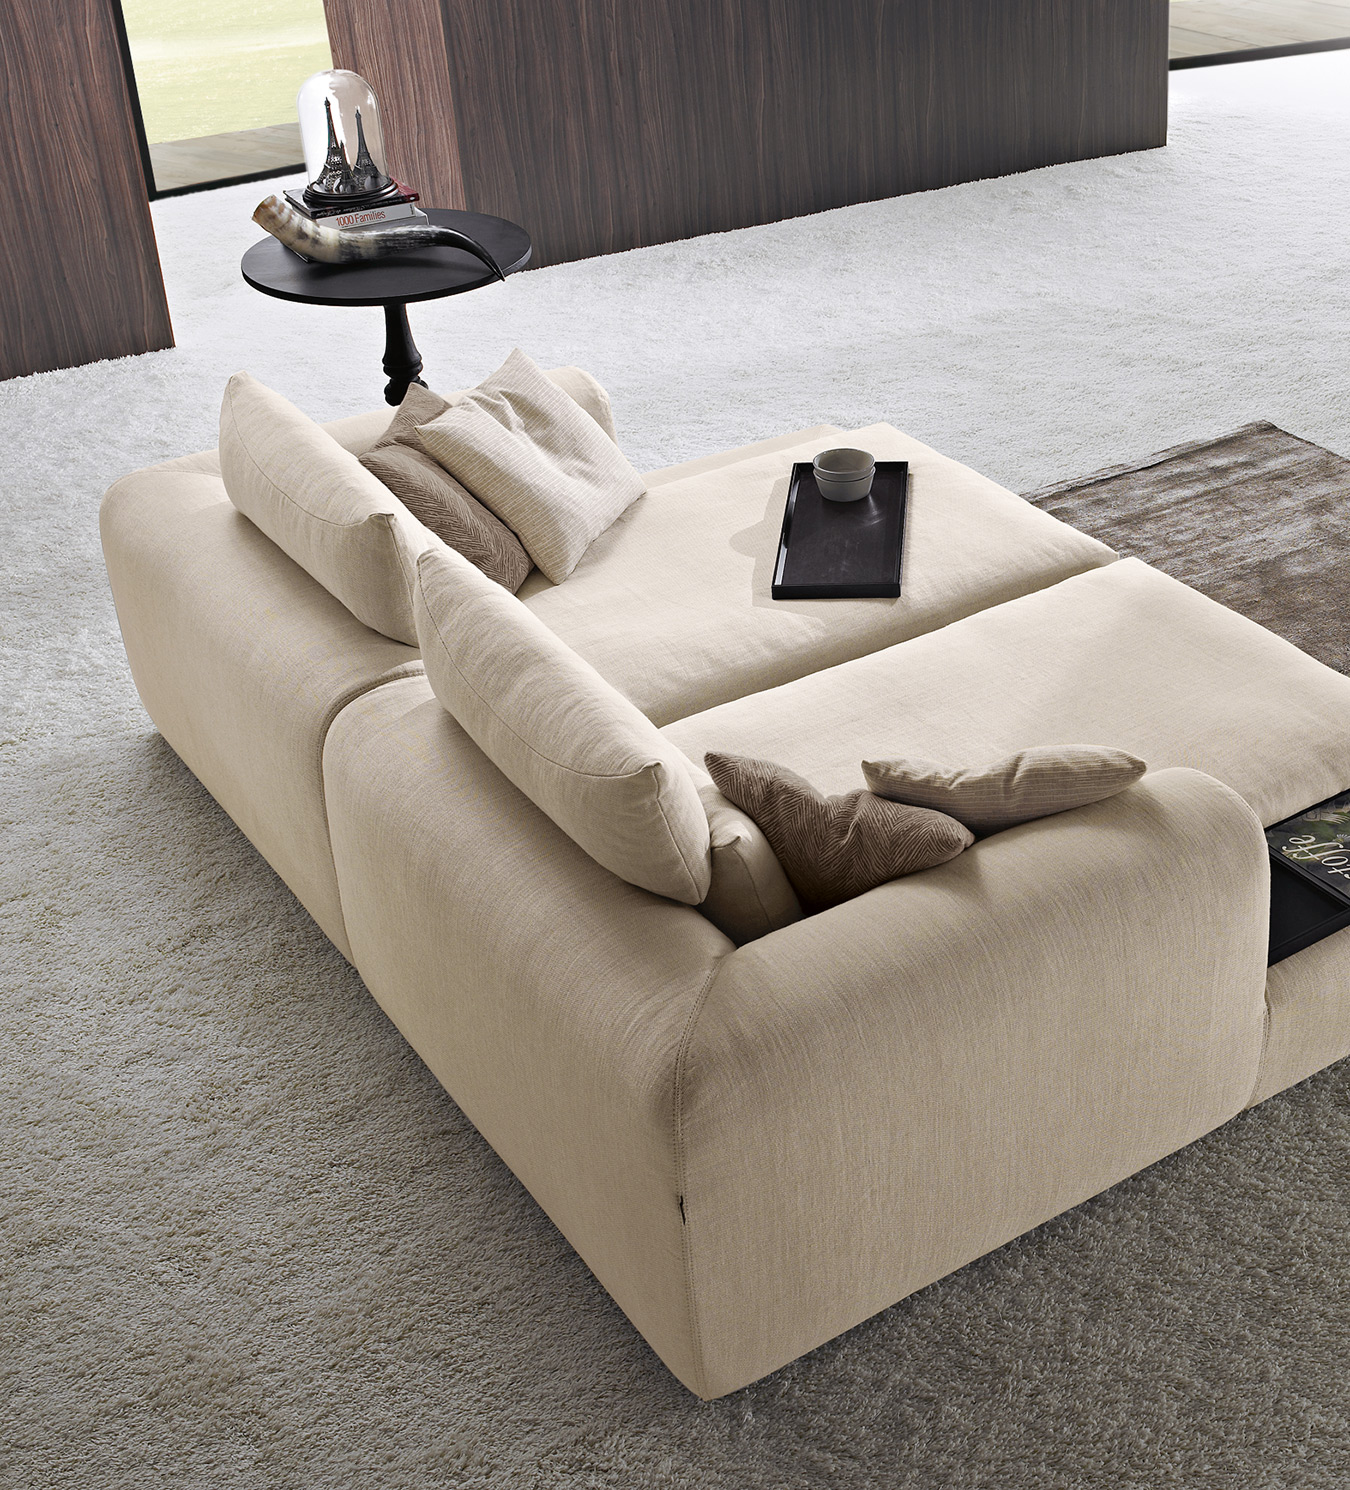 comfy sofa bed, beige fabric sofa that is bed, wide sofa for playroom, platis kananapes krevati, kanapes krevati xoris podia, chaise long sofa fabric, kanapes ifasmatinos mpez megalos se vathos,